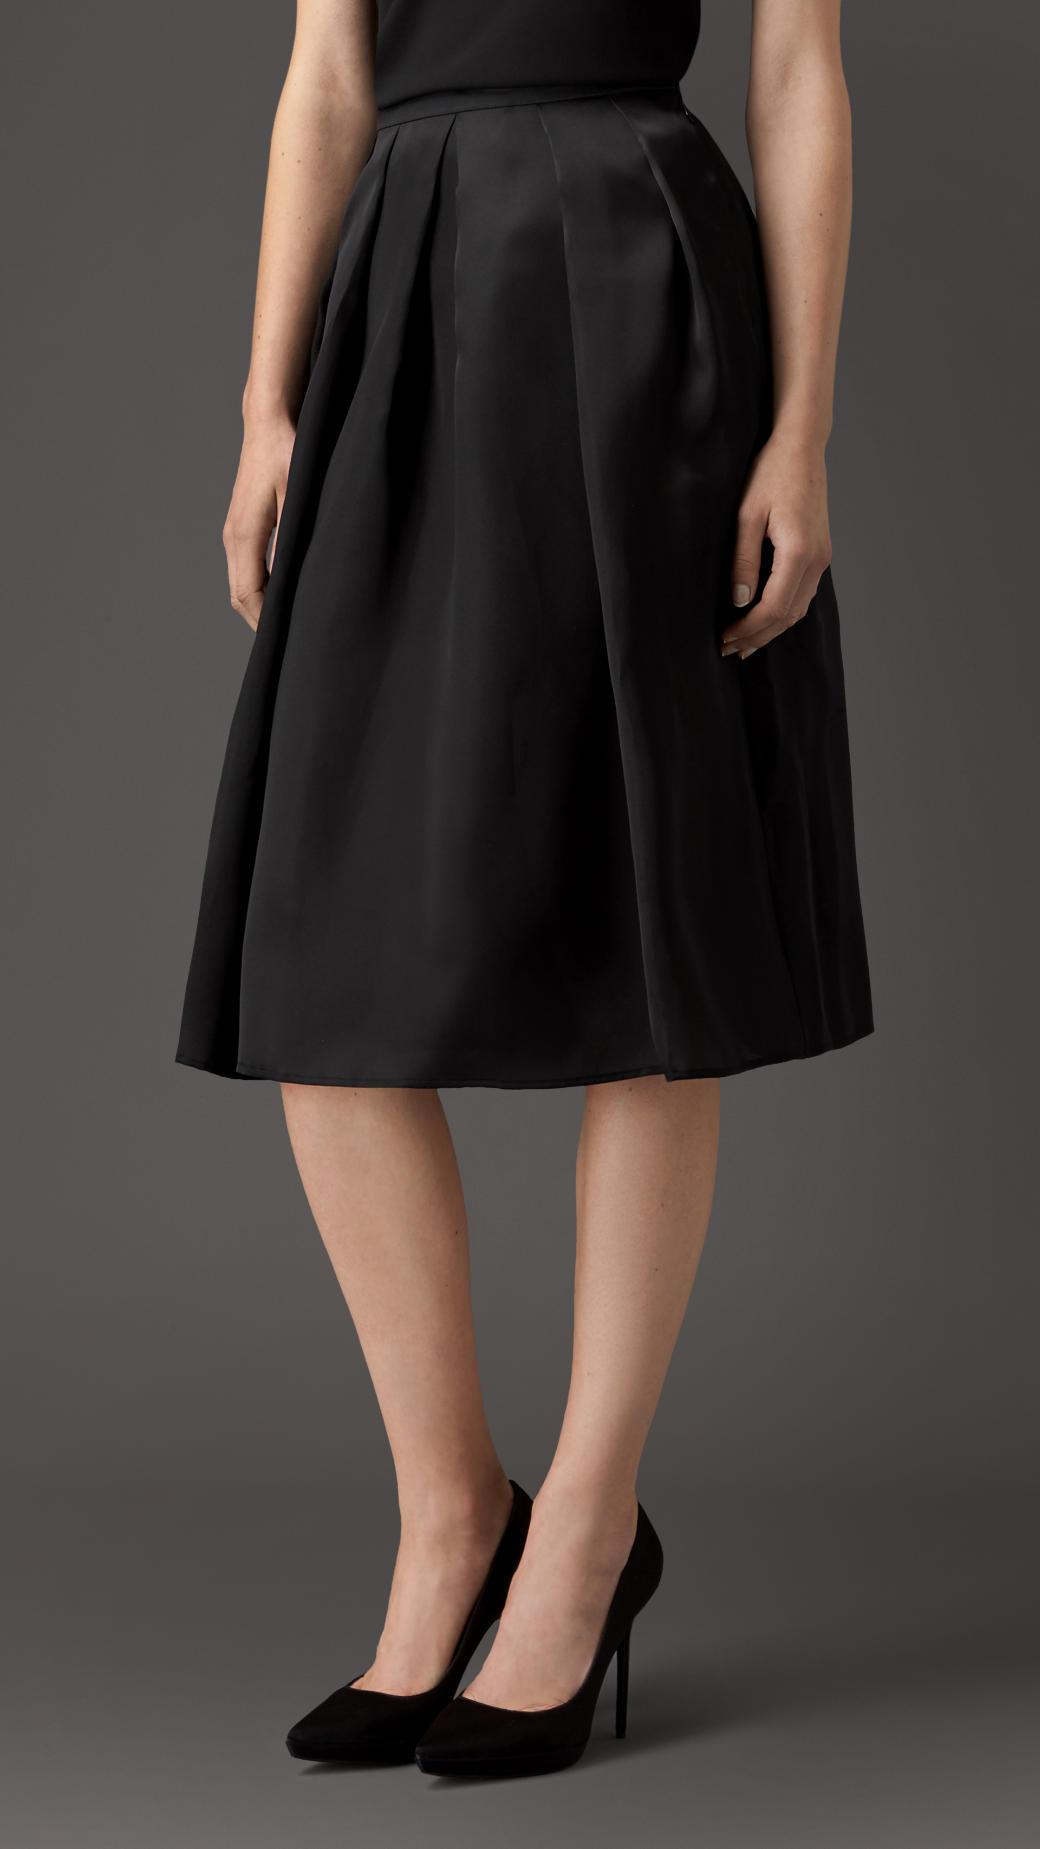 burberry sculptured silk skirt in black lyst